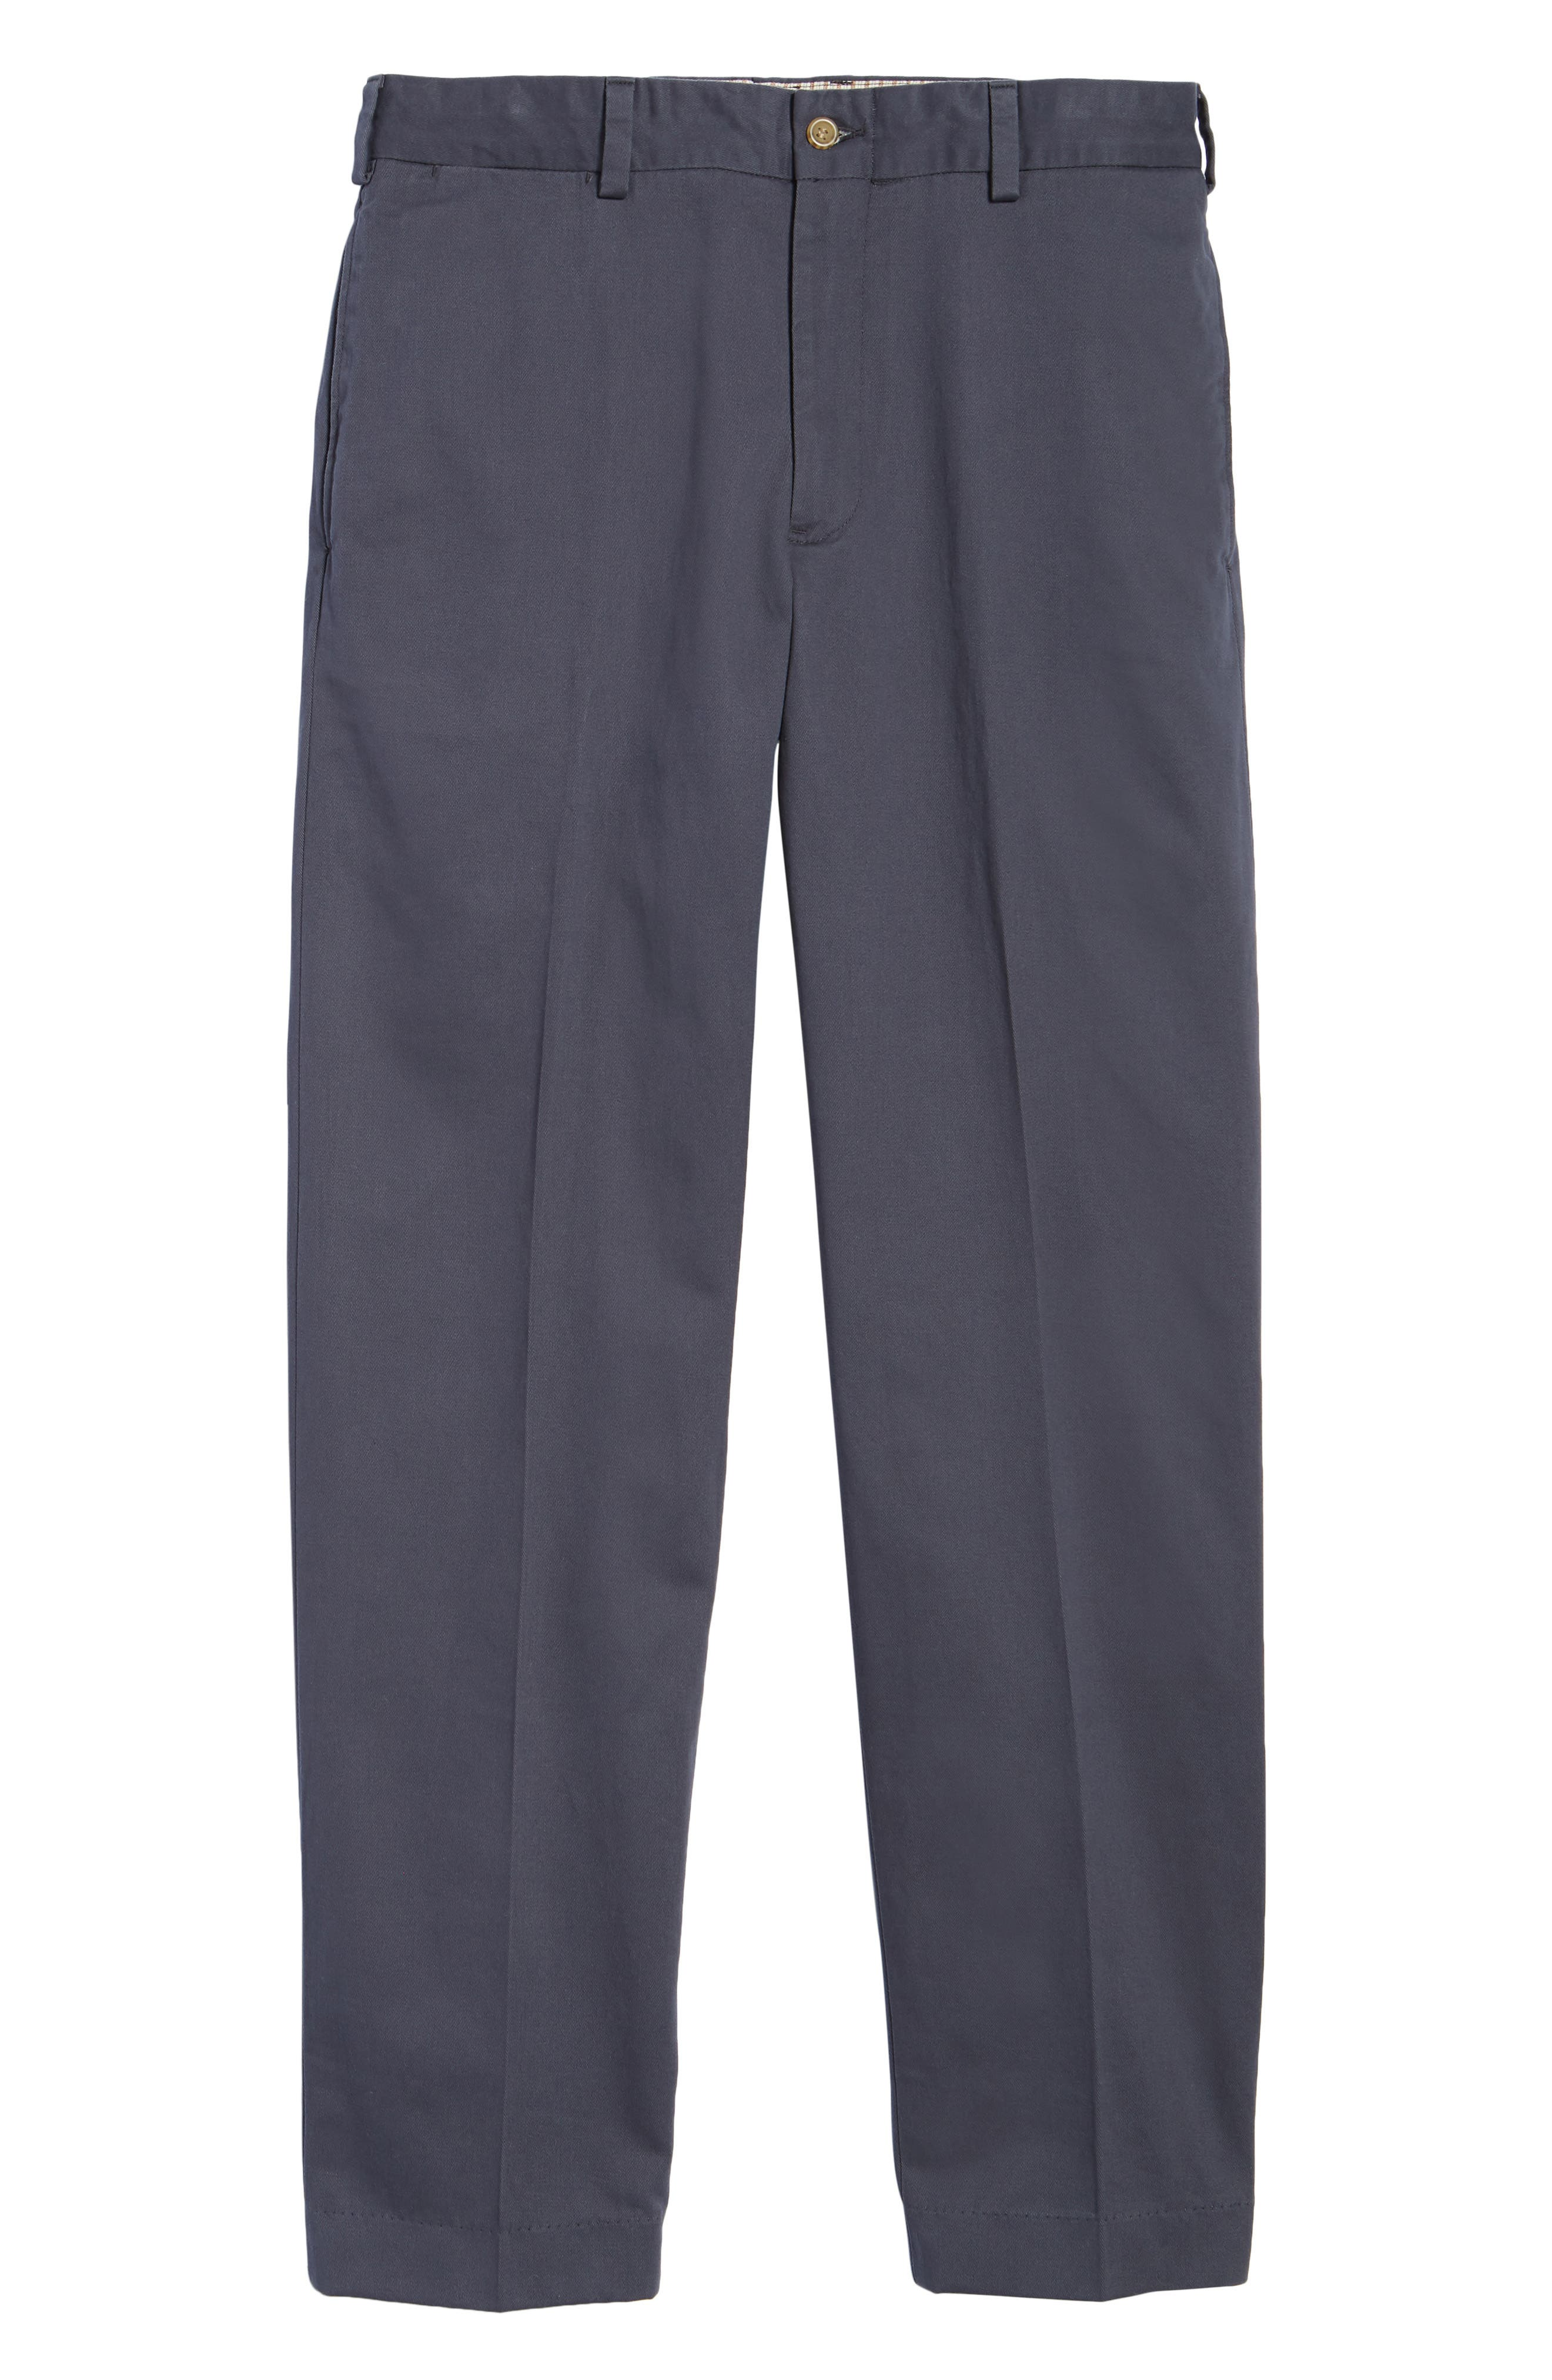 M2 Classic Fit Flat Front Vintage Twill Pants,                             Alternate thumbnail 6, color,                             410